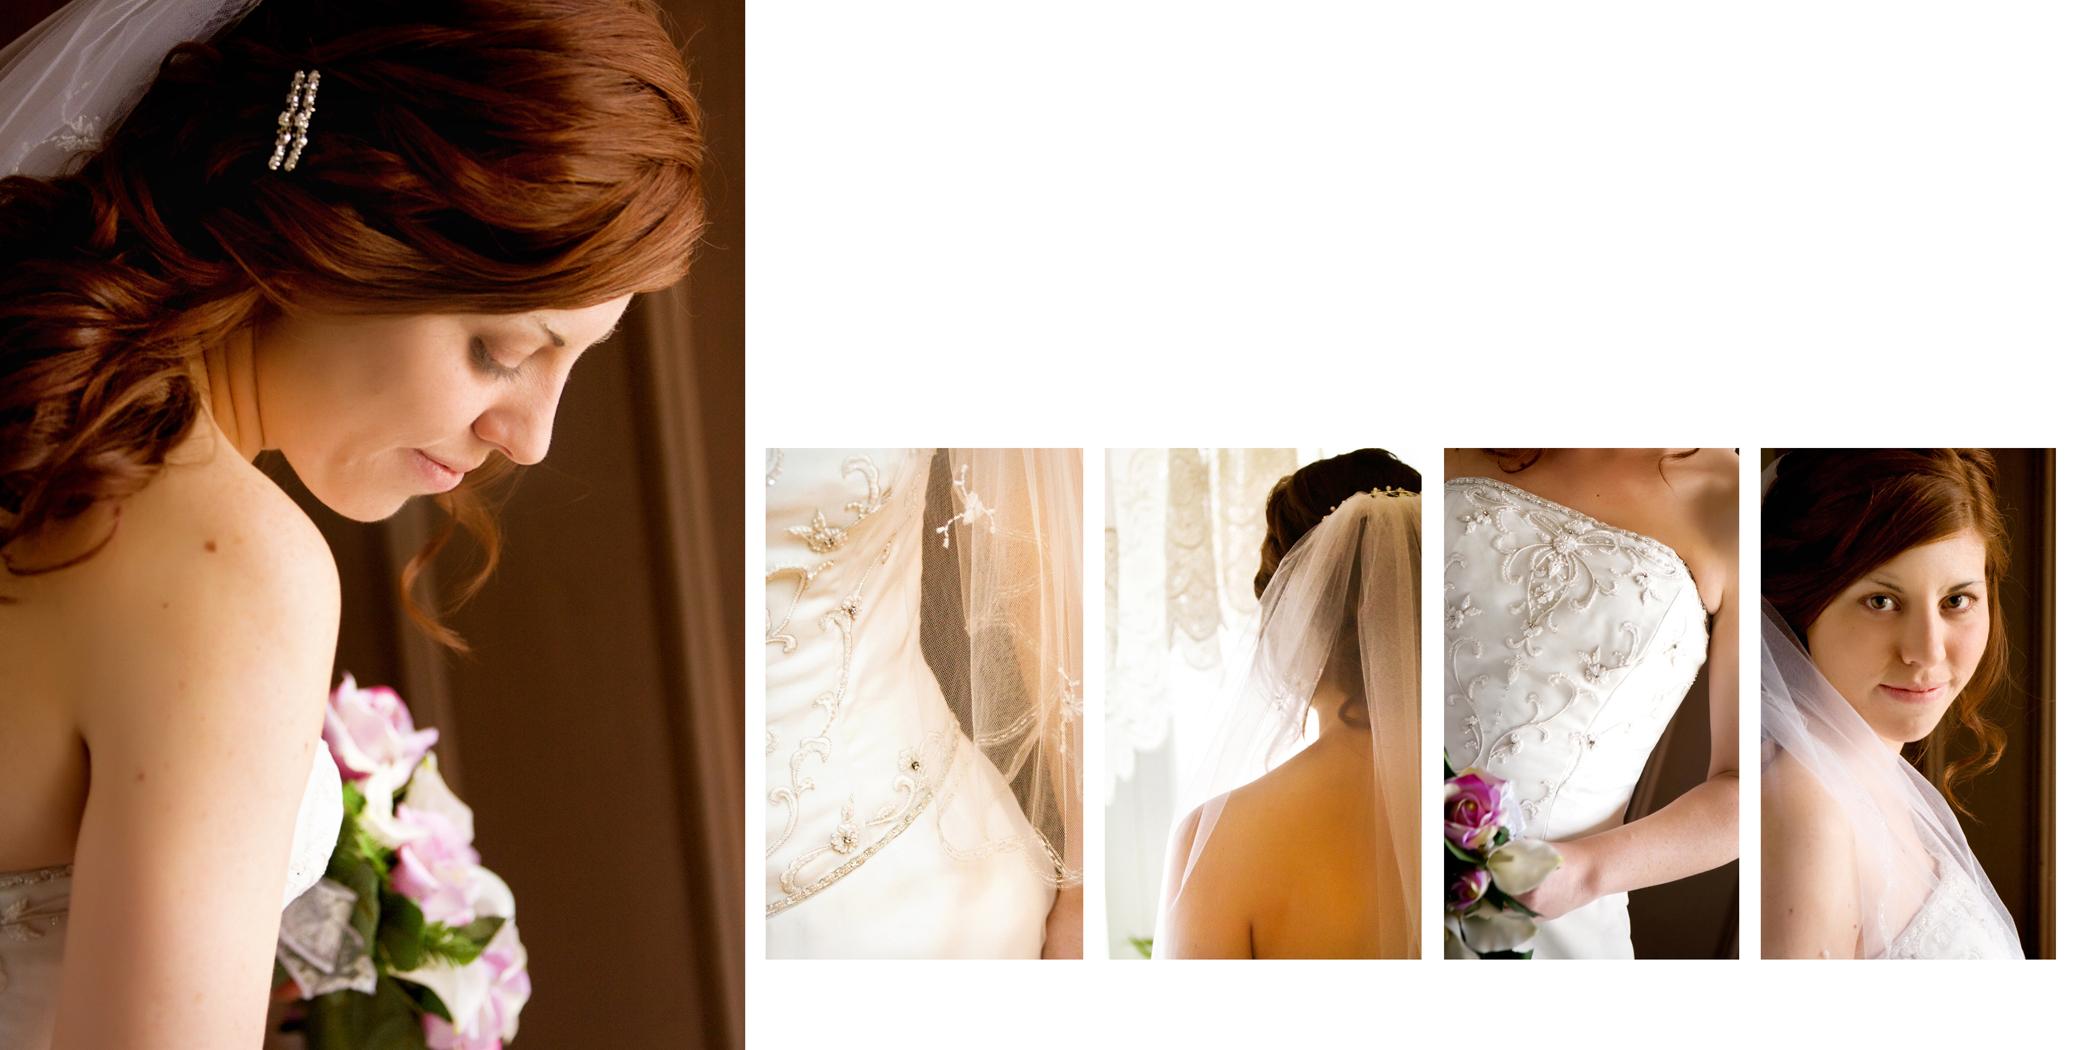 wedding-photography-Andrews-University-Berrien-Springs-Michigan_03.jpg